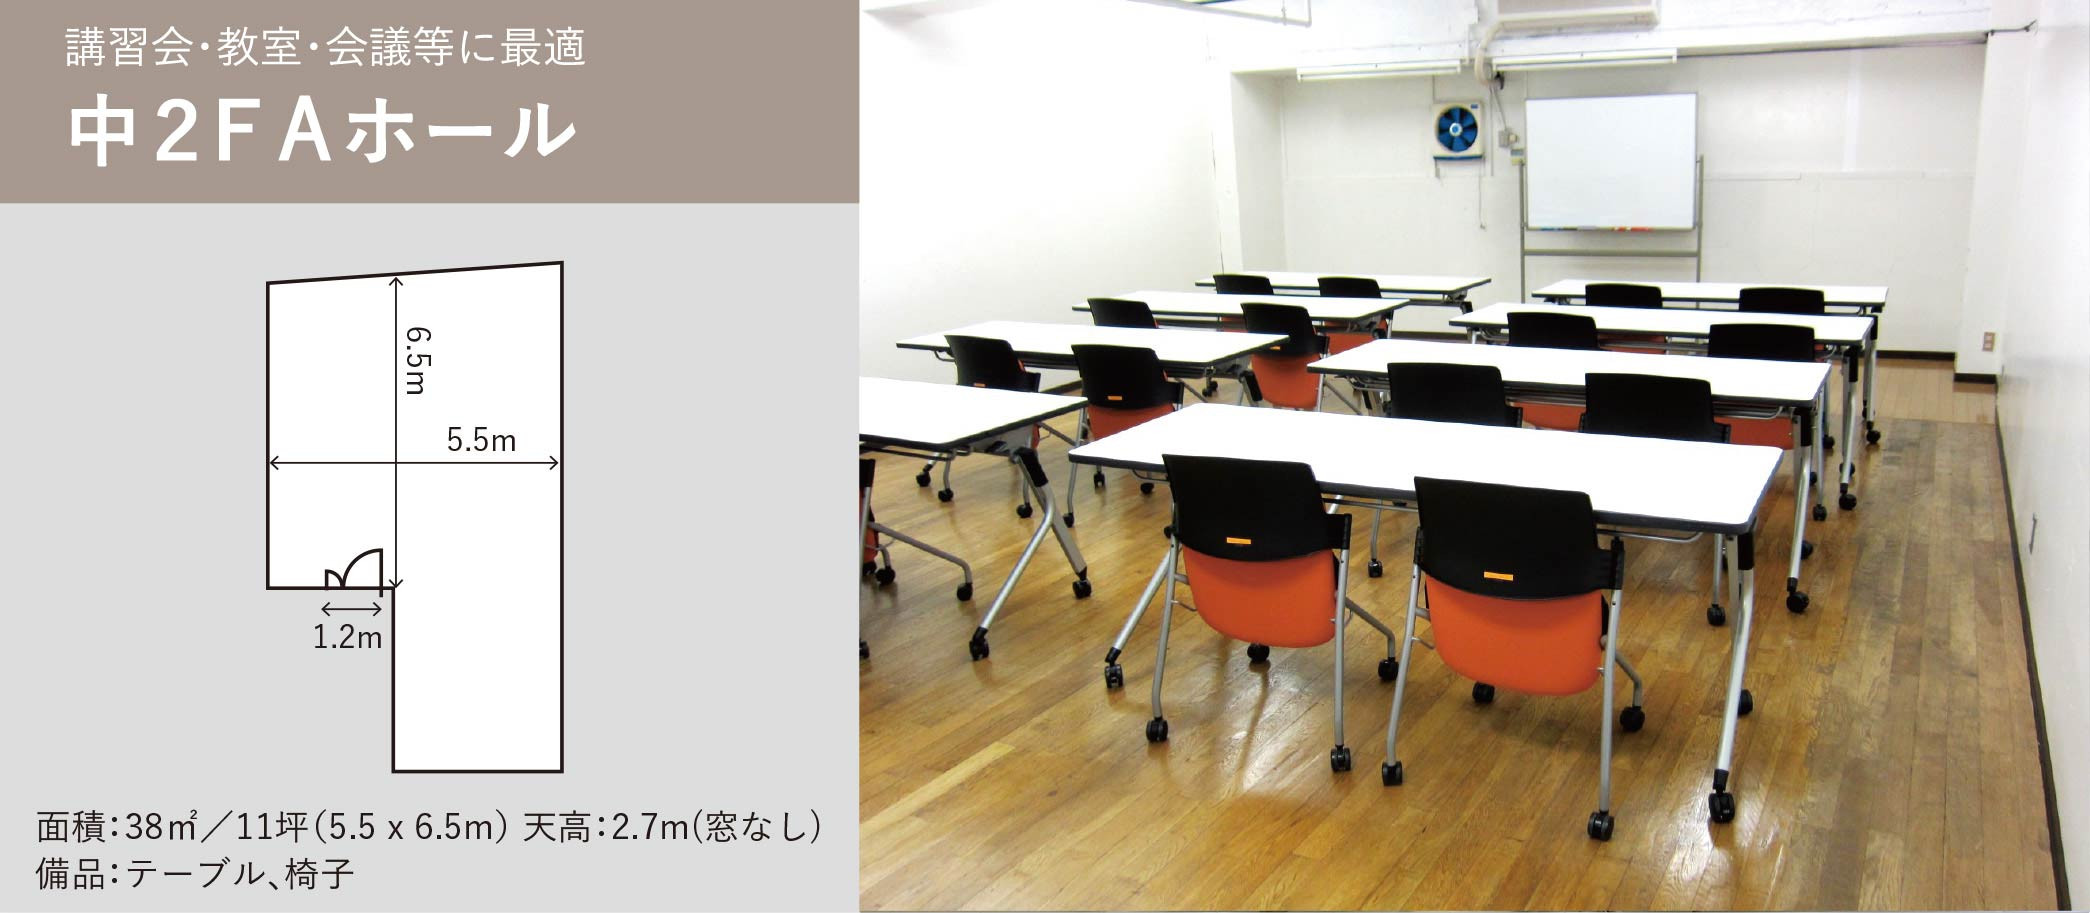 Hall_M2F-A.jpg